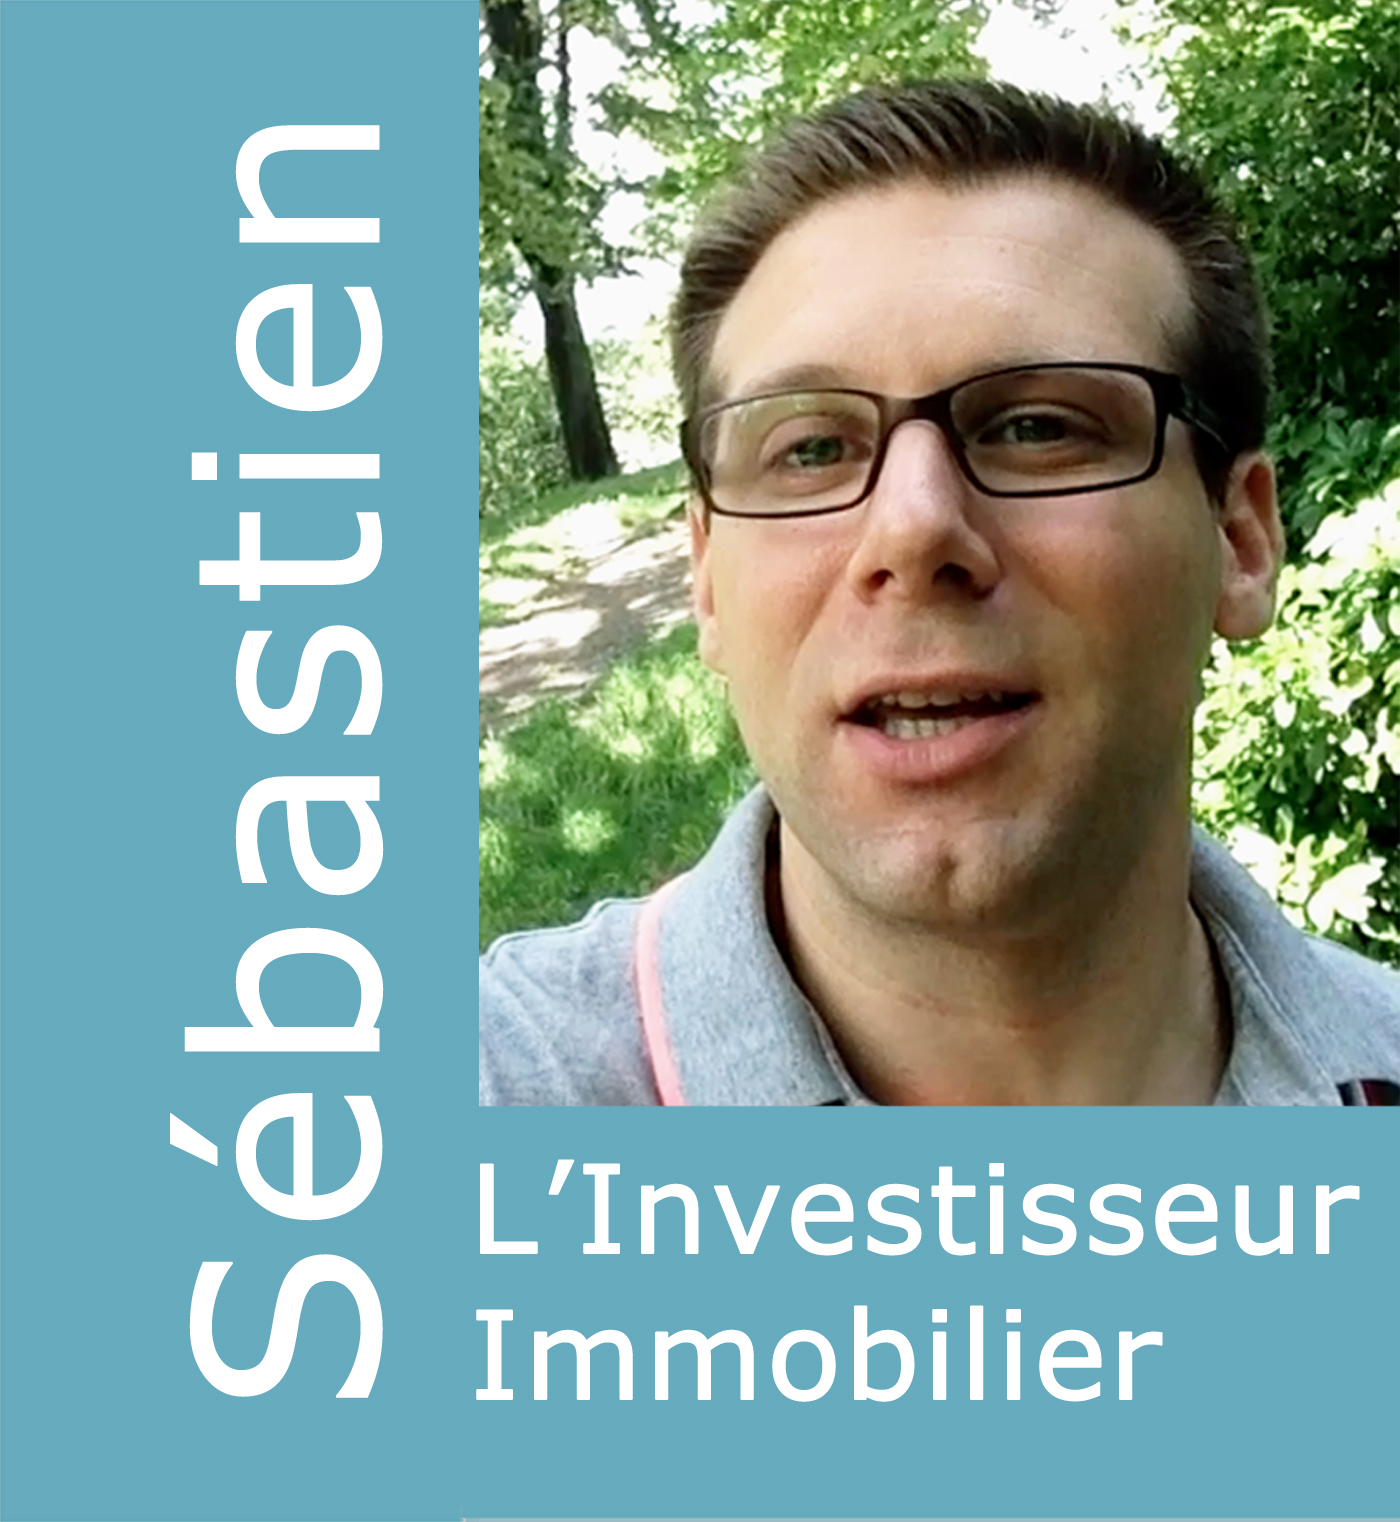 Apprendre l'Investissement Immobilier